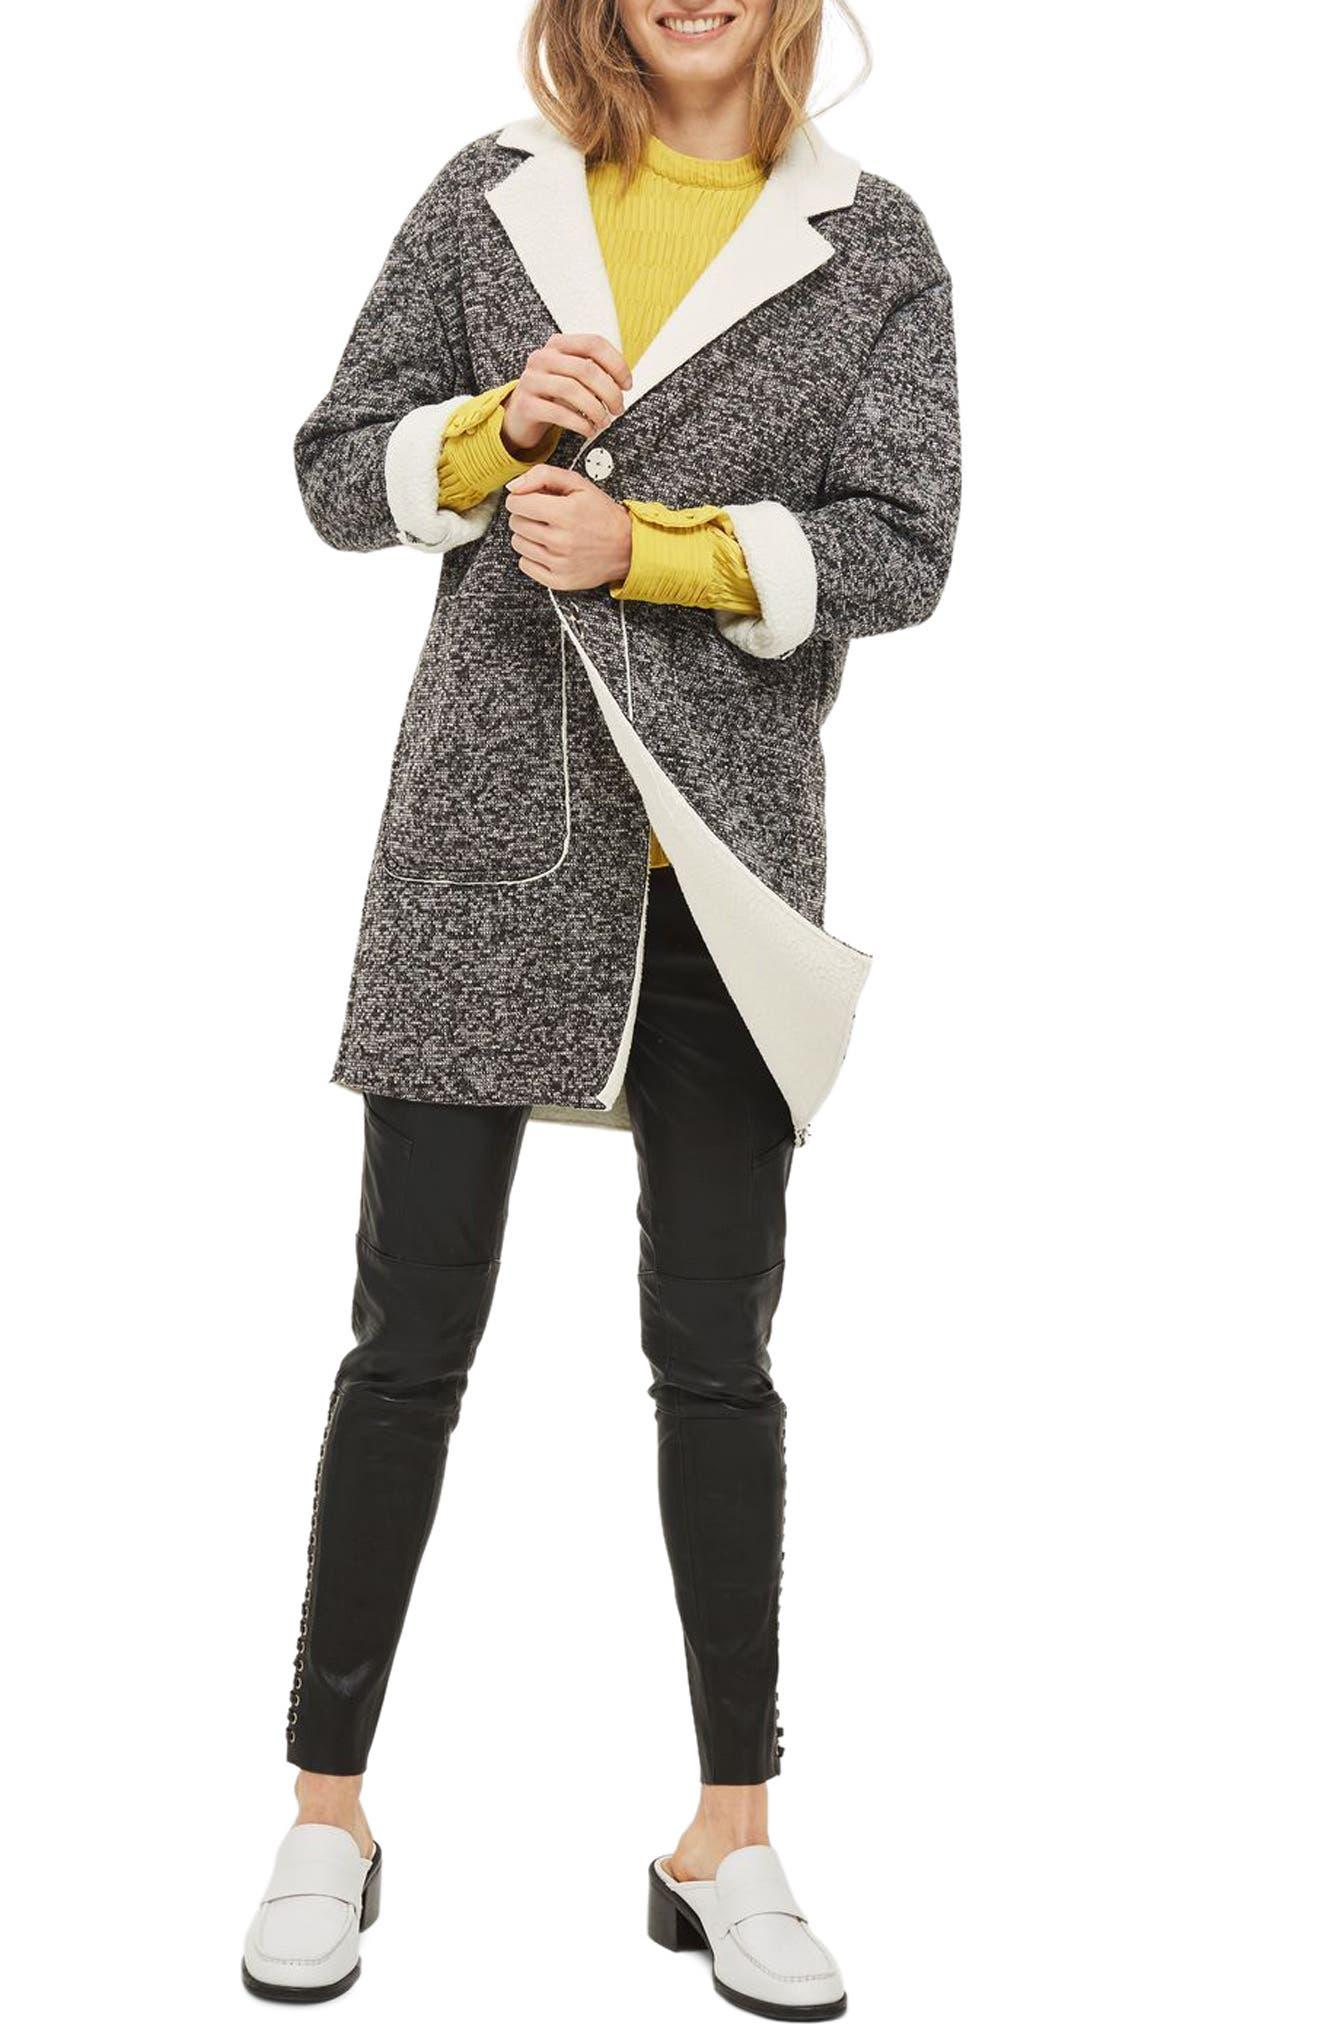 Topshop Salt & Pepper Knit Bonded Borg Coat